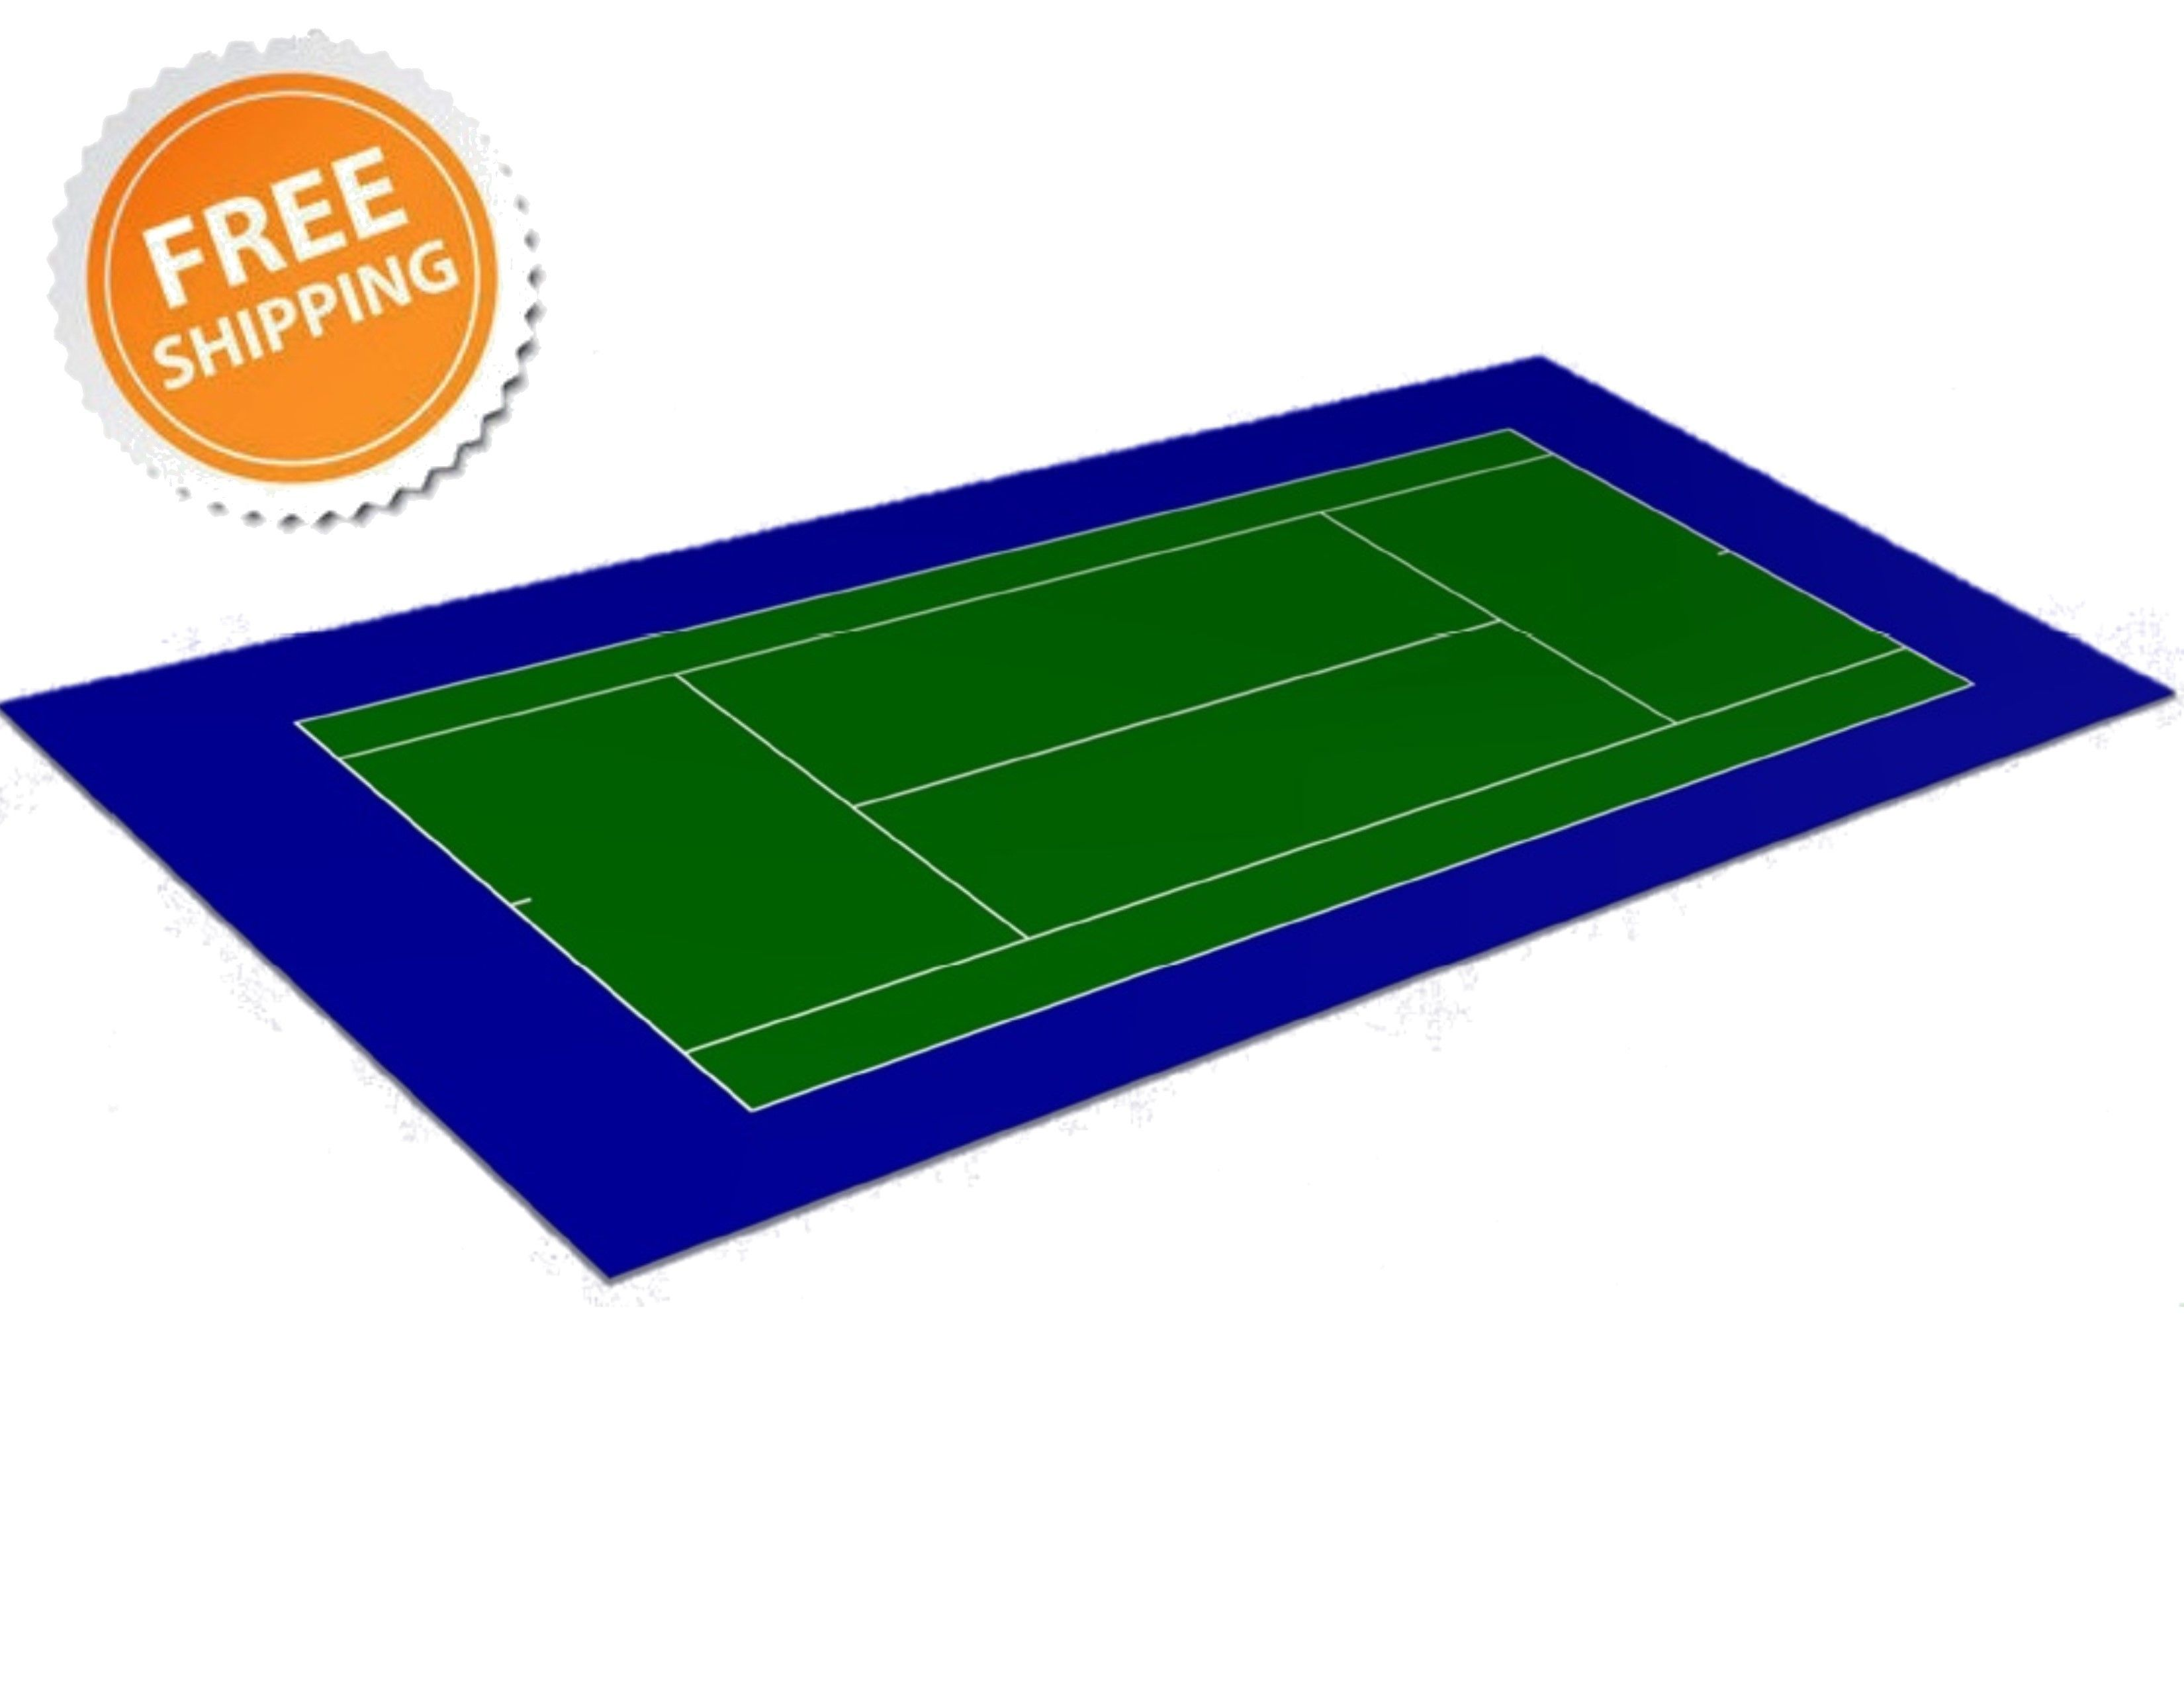 Single 60x120 Tennis Court Tennis Court At Home Gym Aerobic Flooring